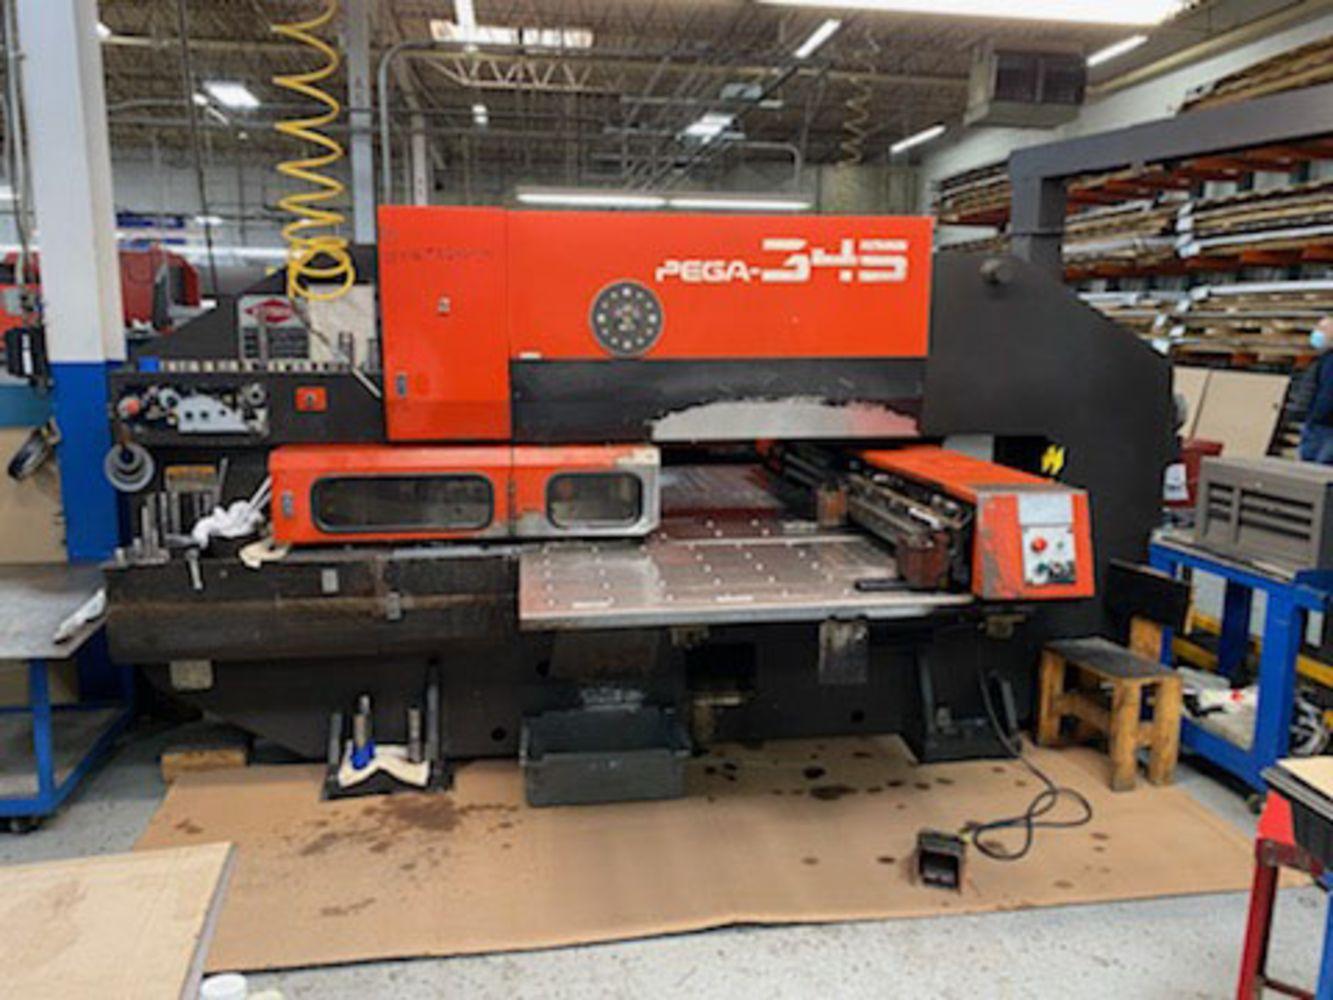 MONTANA METAL PRODUCTS - DAY 1 of 2 - Sheet Metal Fab, CNC Machining & Metal Finishing Facility